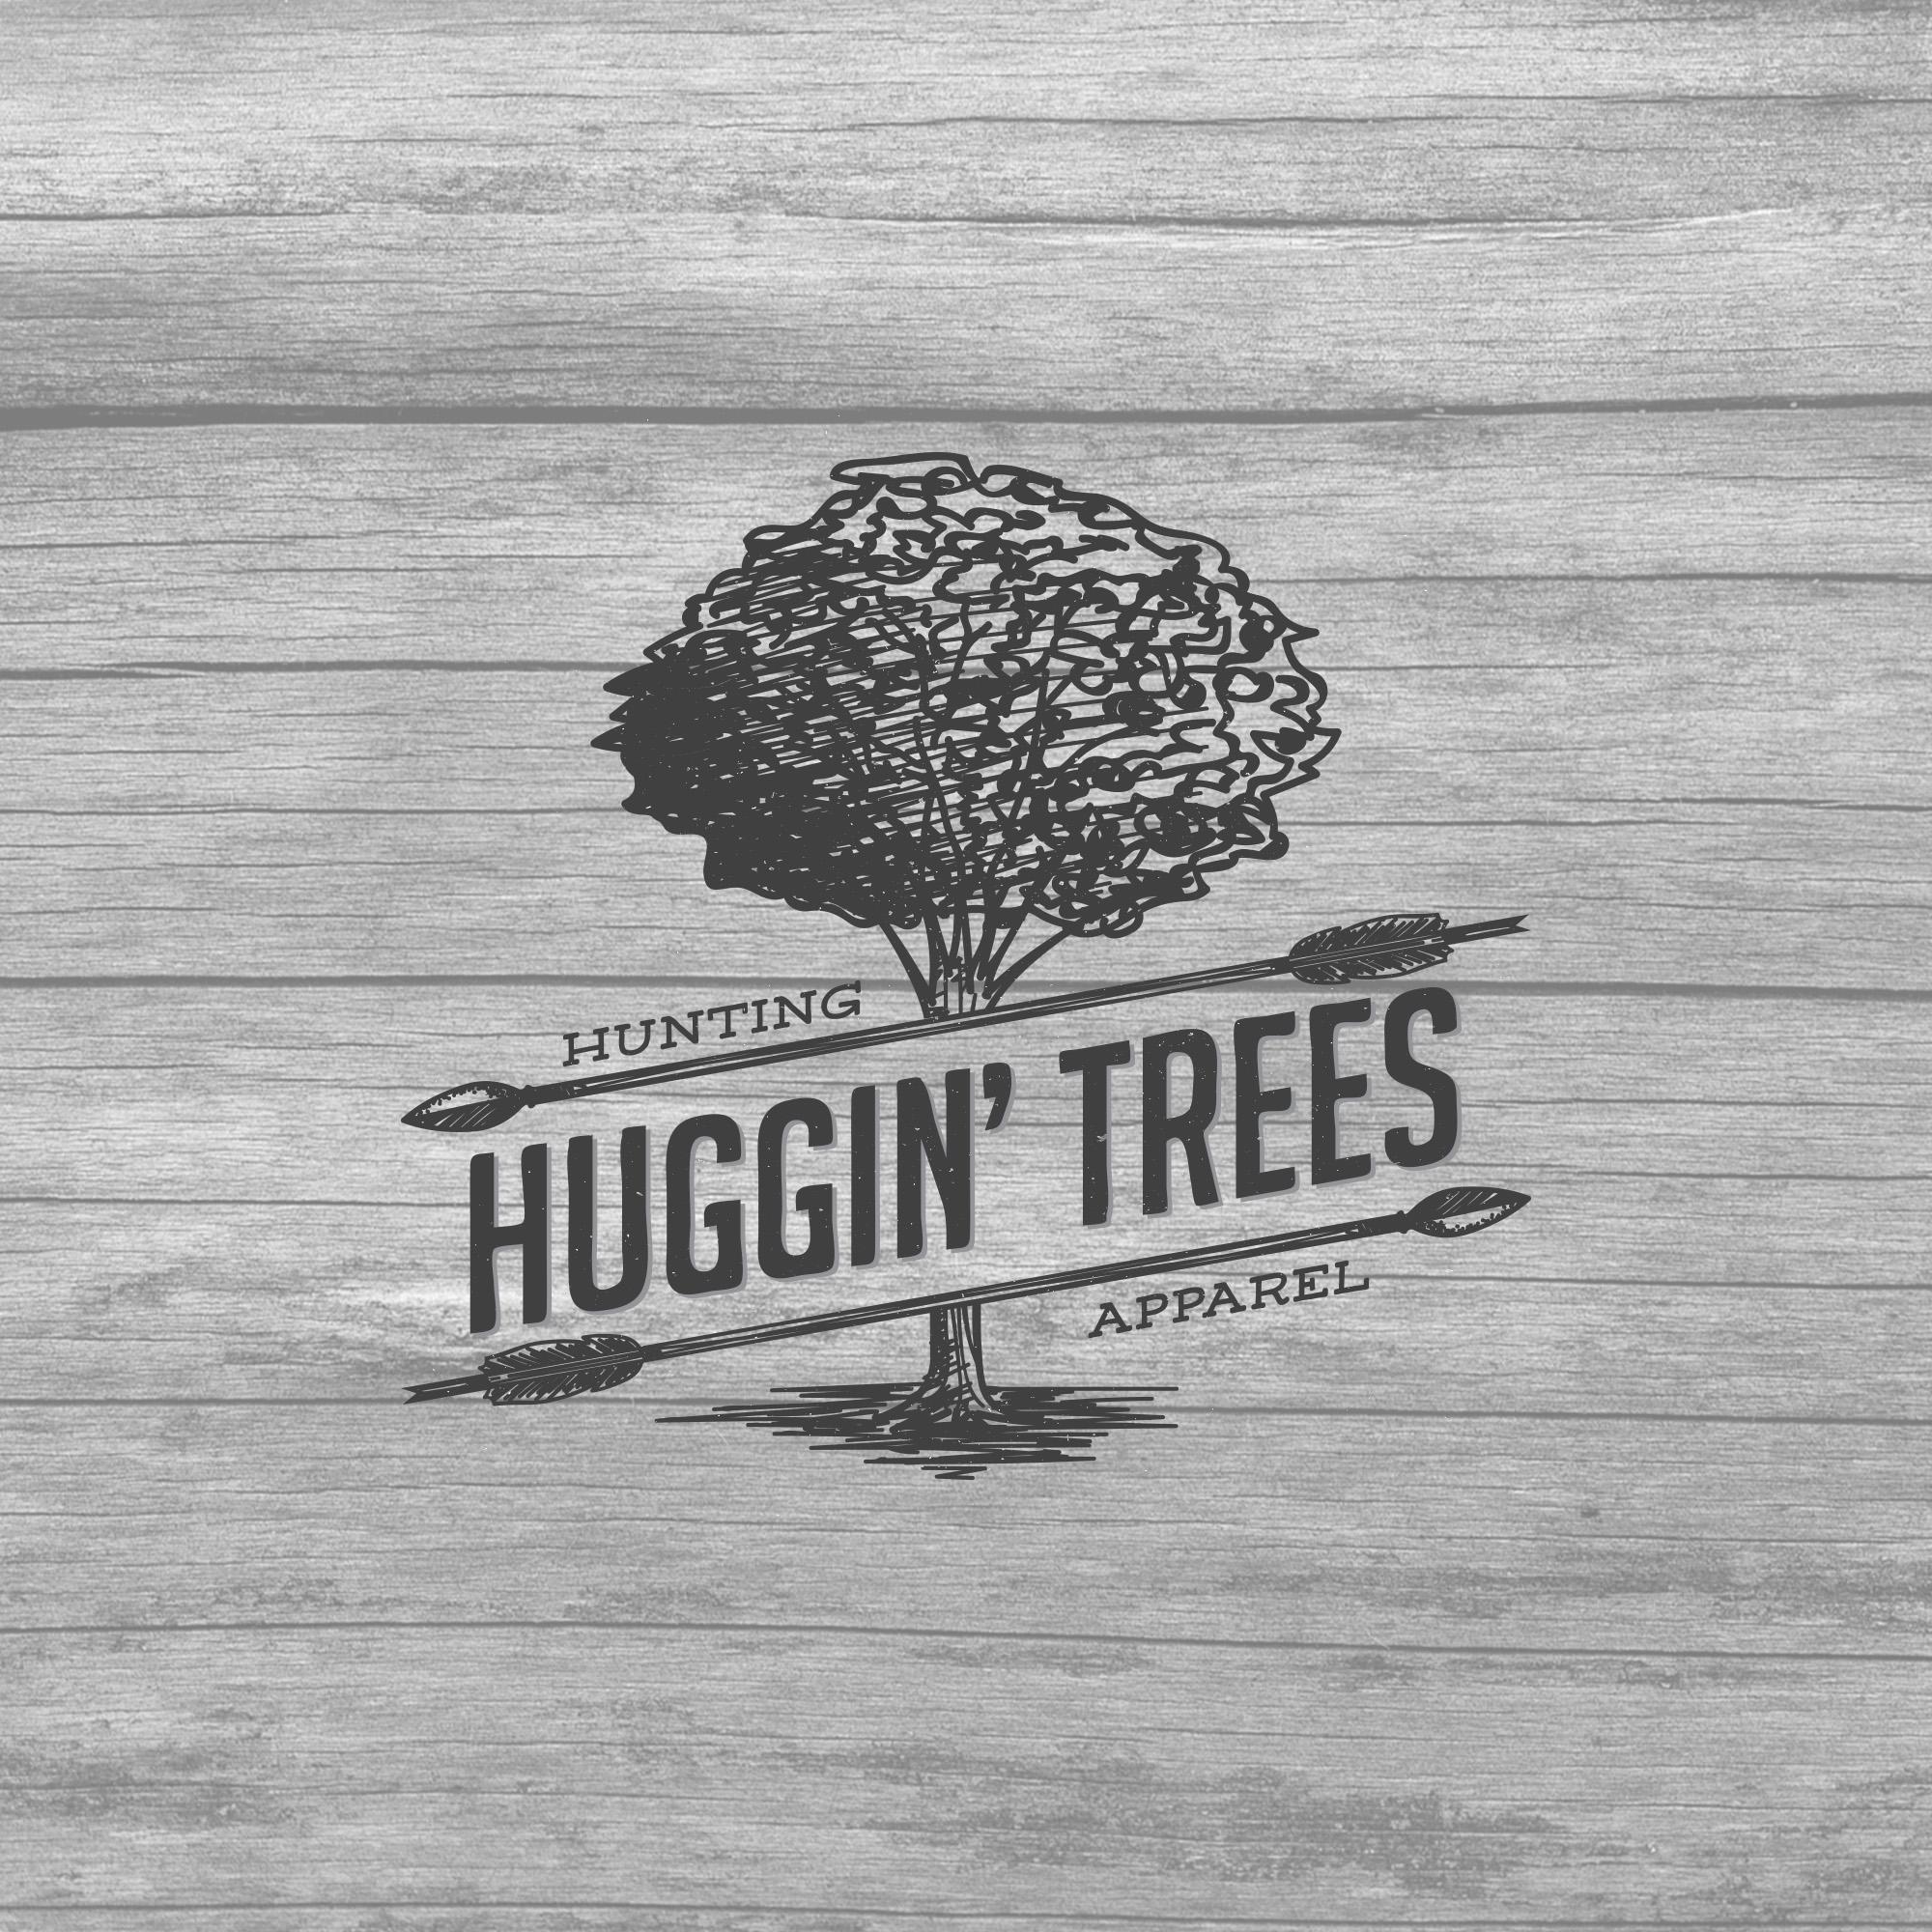 HugginTreesSubmit.jpg